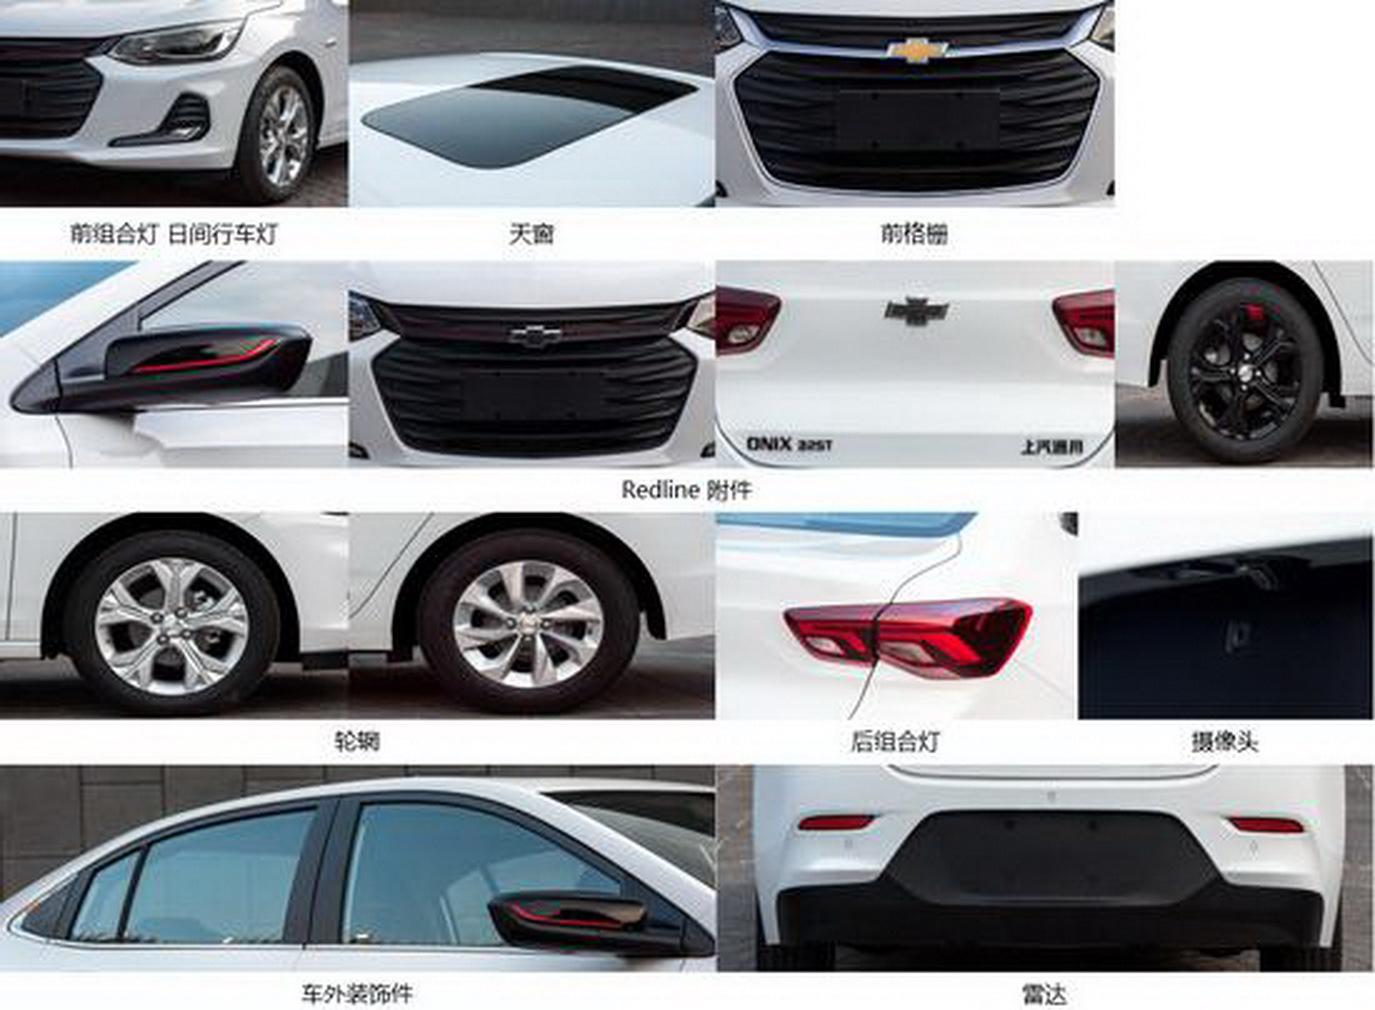 Chevrolet Onix เวอร์ชั่นจีน